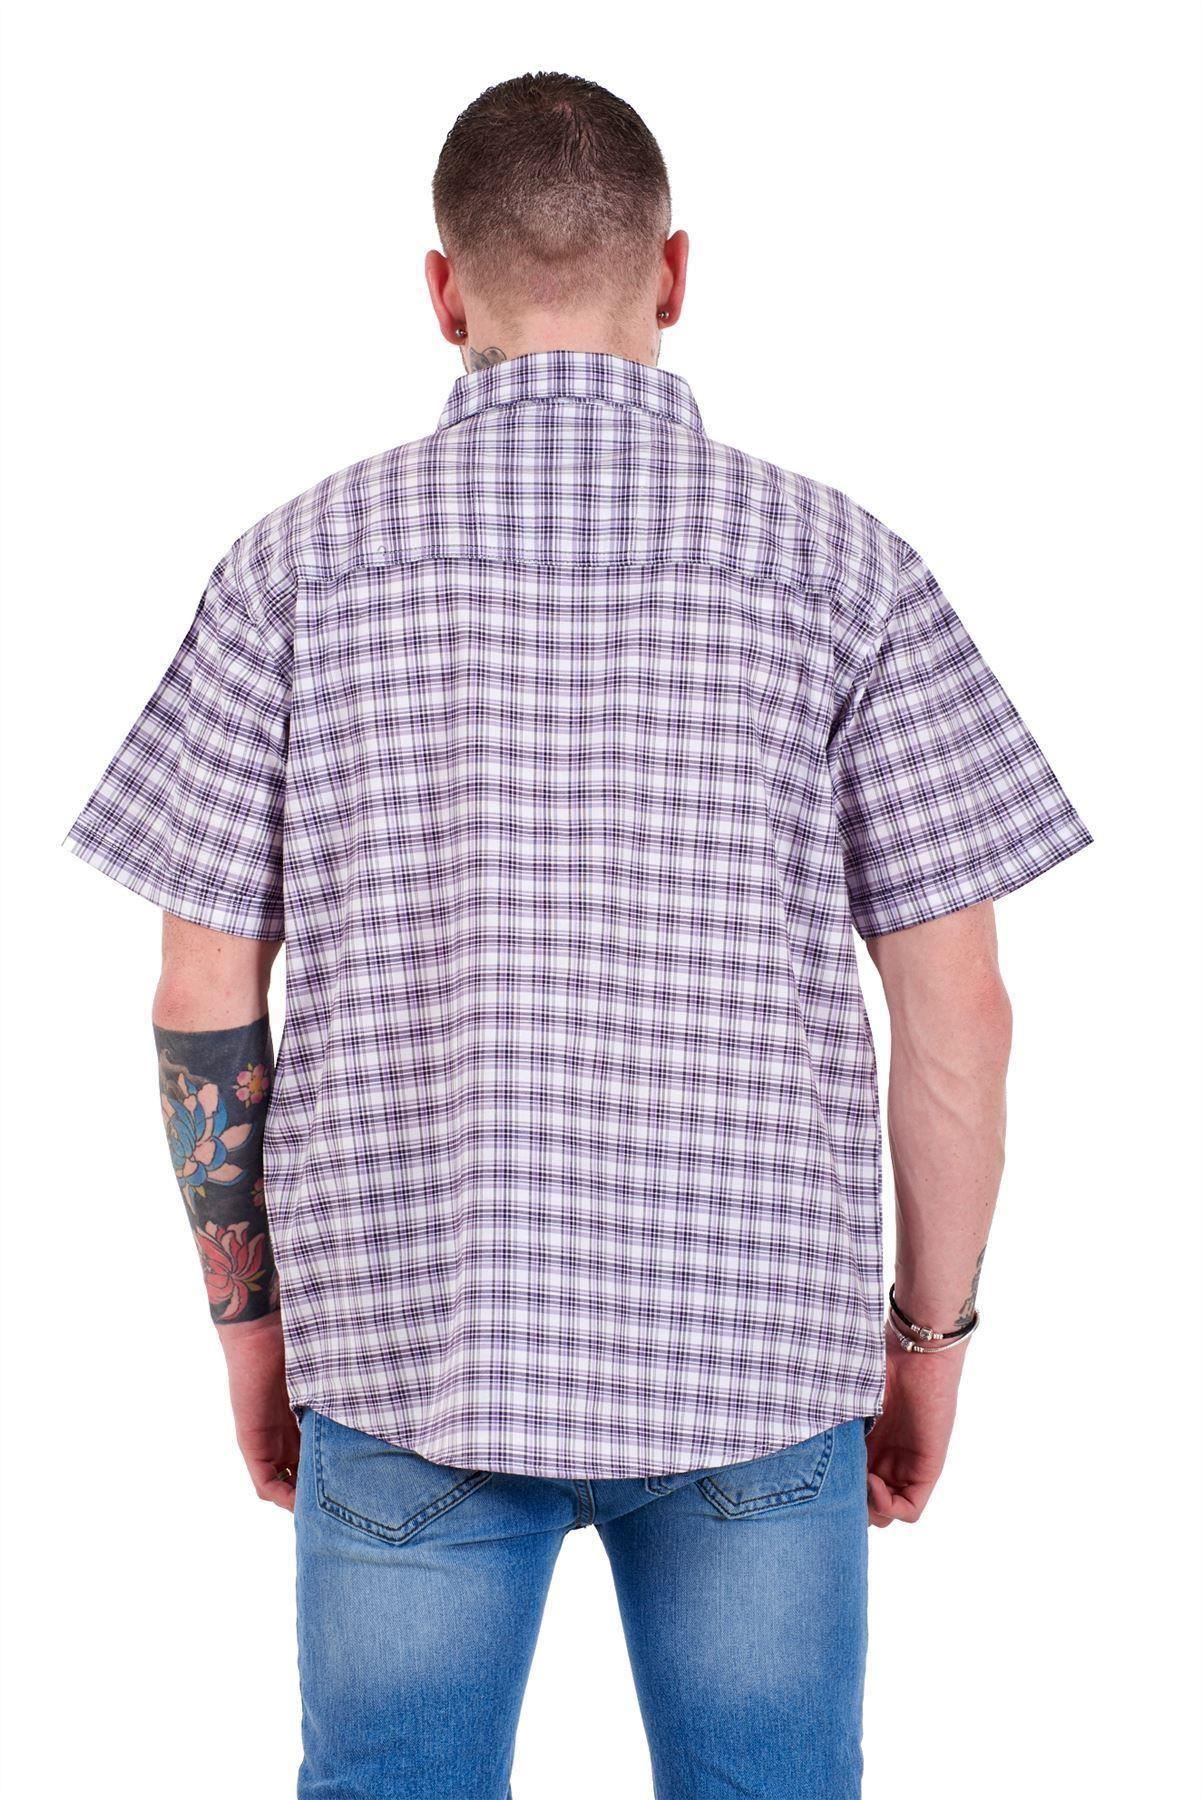 Mens-Regular-Big-Size-Shirts-Checked-Cotton-Blend-Casual-Short-Sleeve-M-to-5XL thumbnail 23